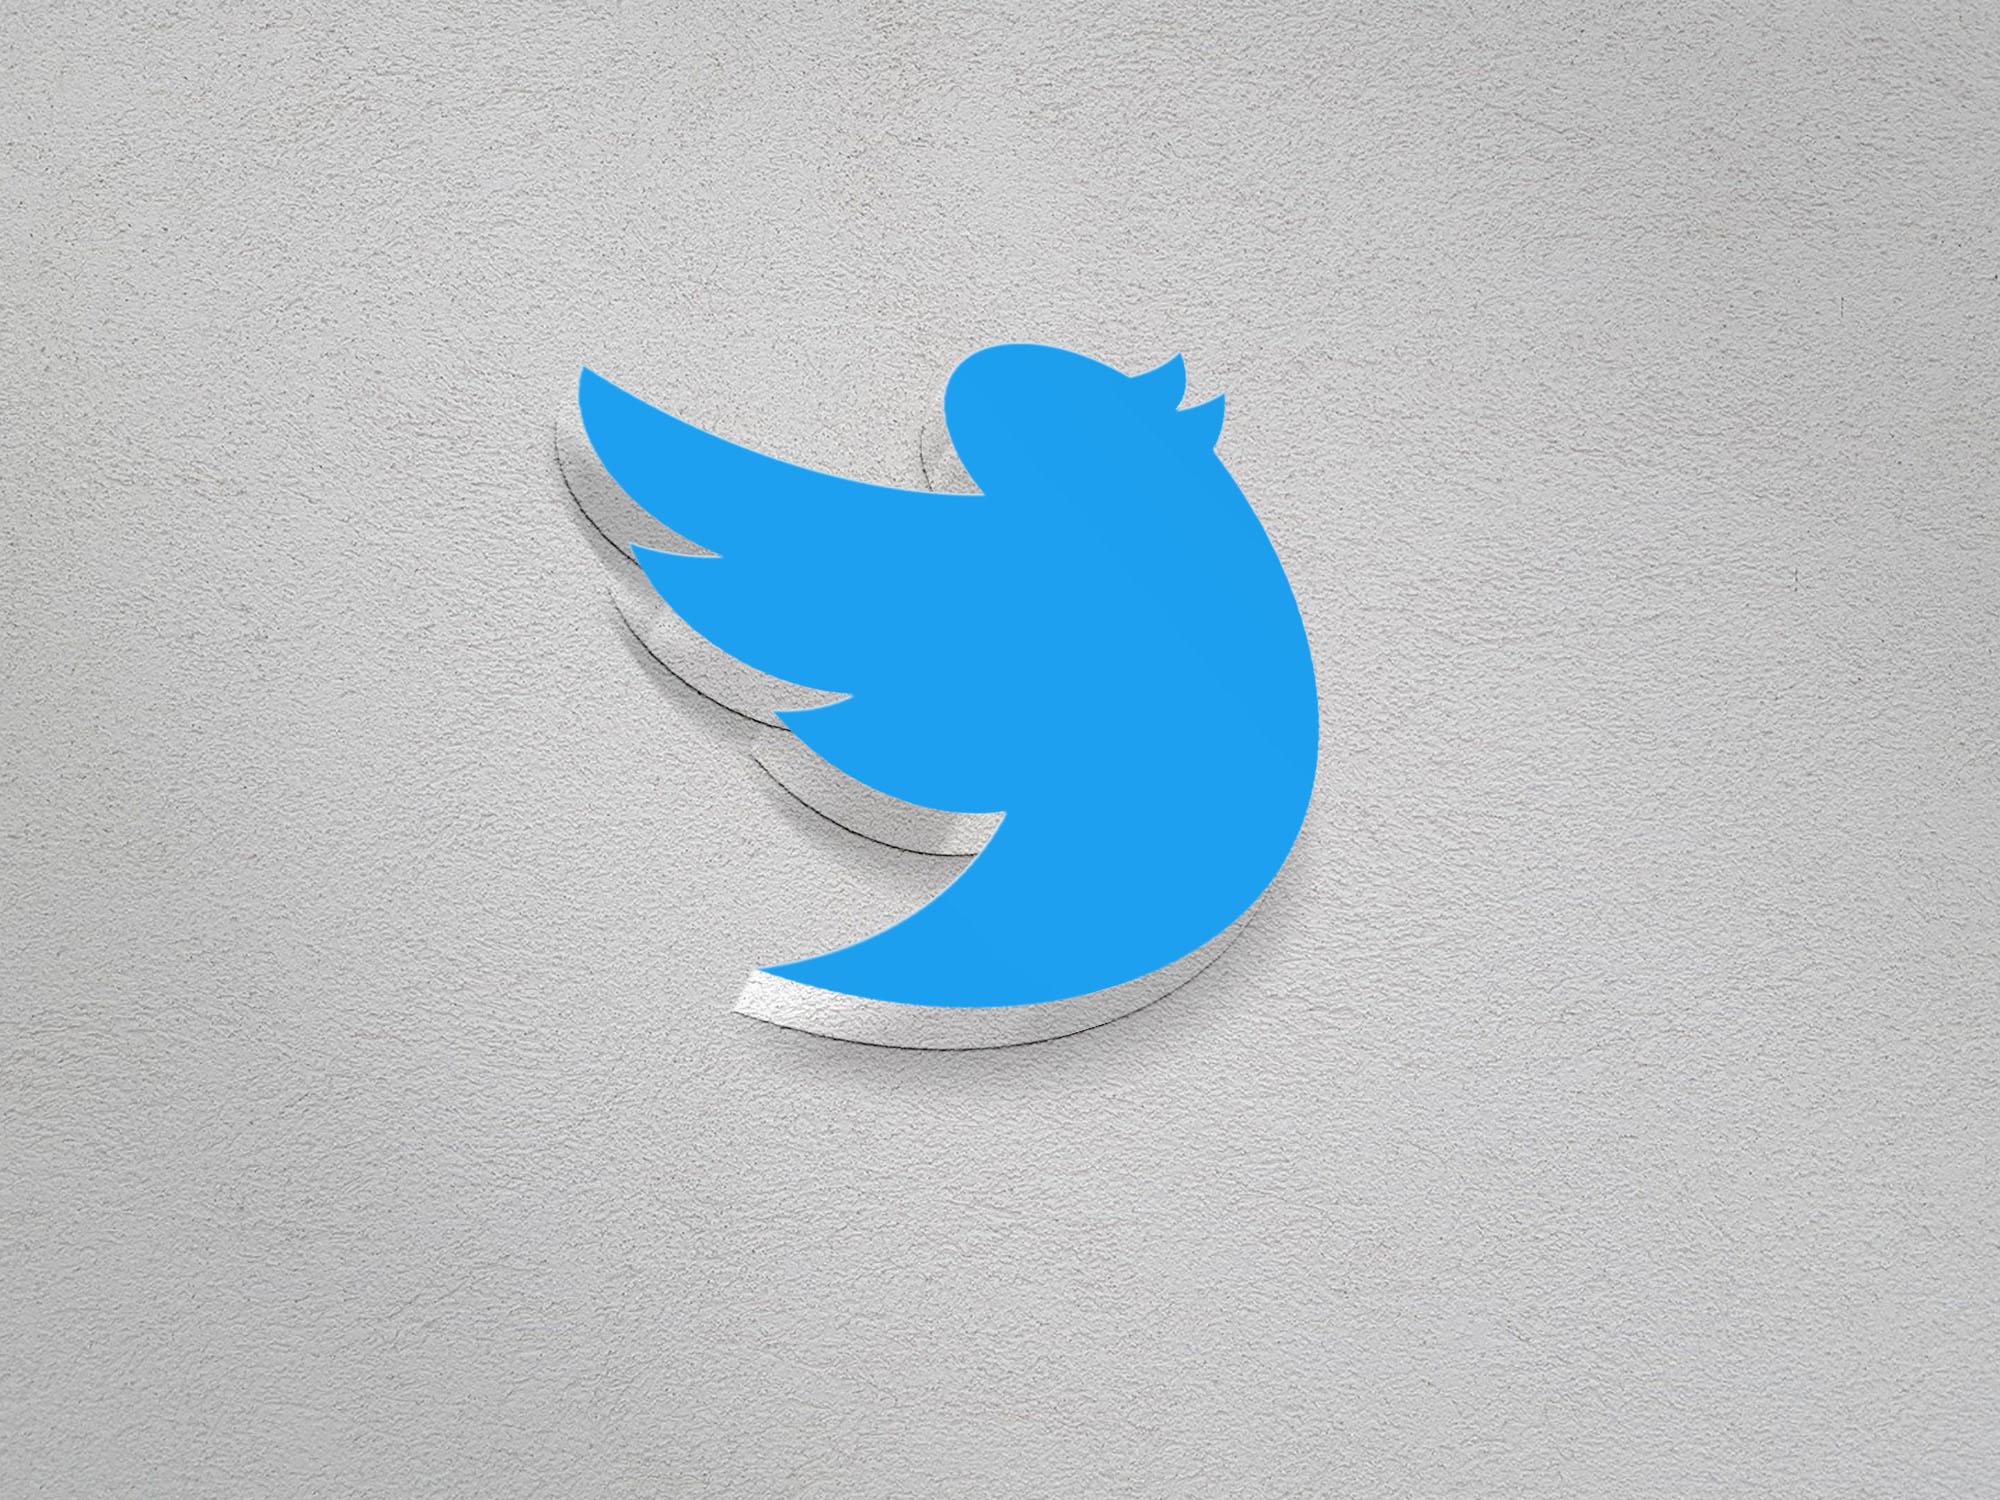 Twitter Logo on 3d realistic wall mockup